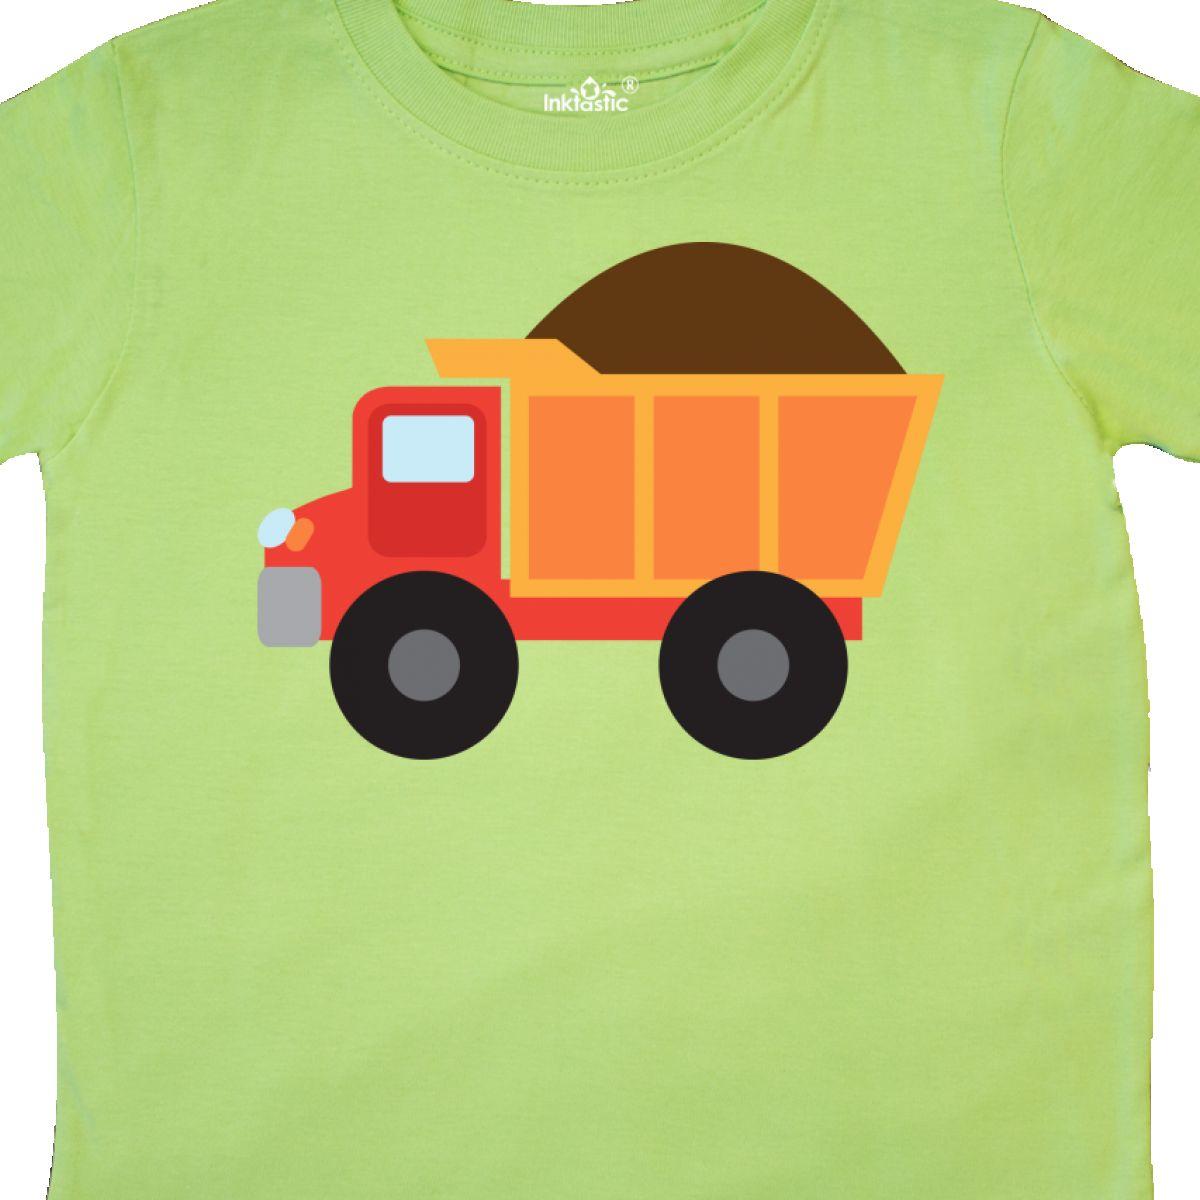 Inktastic-Work-Truck-Construction-Vehicle-Toddler-T-Shirt-Trucks-Vehicles-Cute thumbnail 16